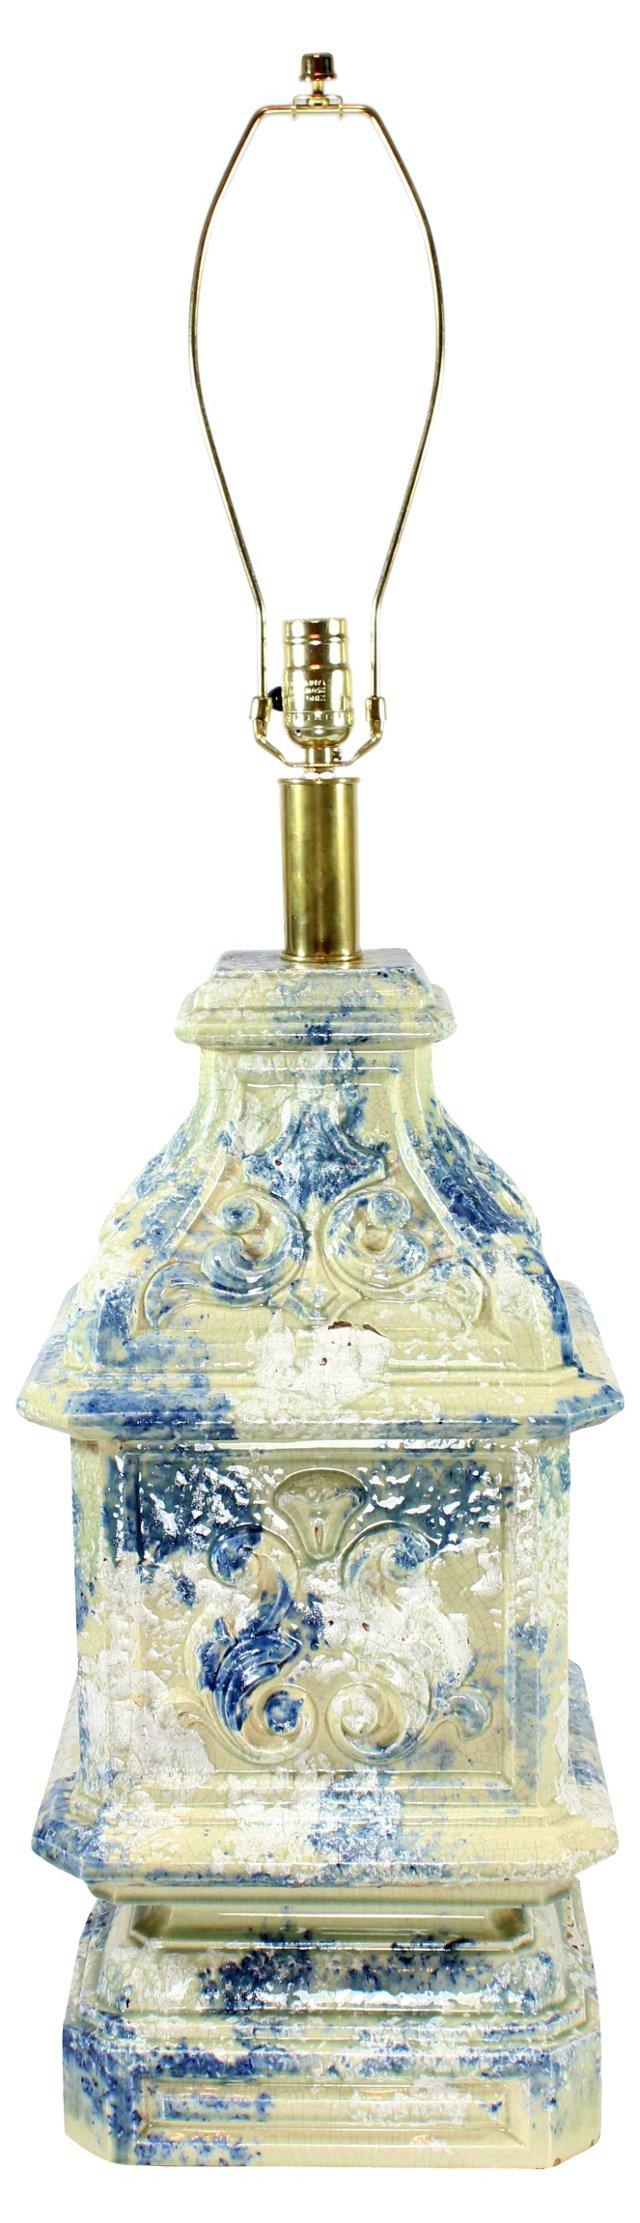 Speckled  Ceramic Tower Lamp